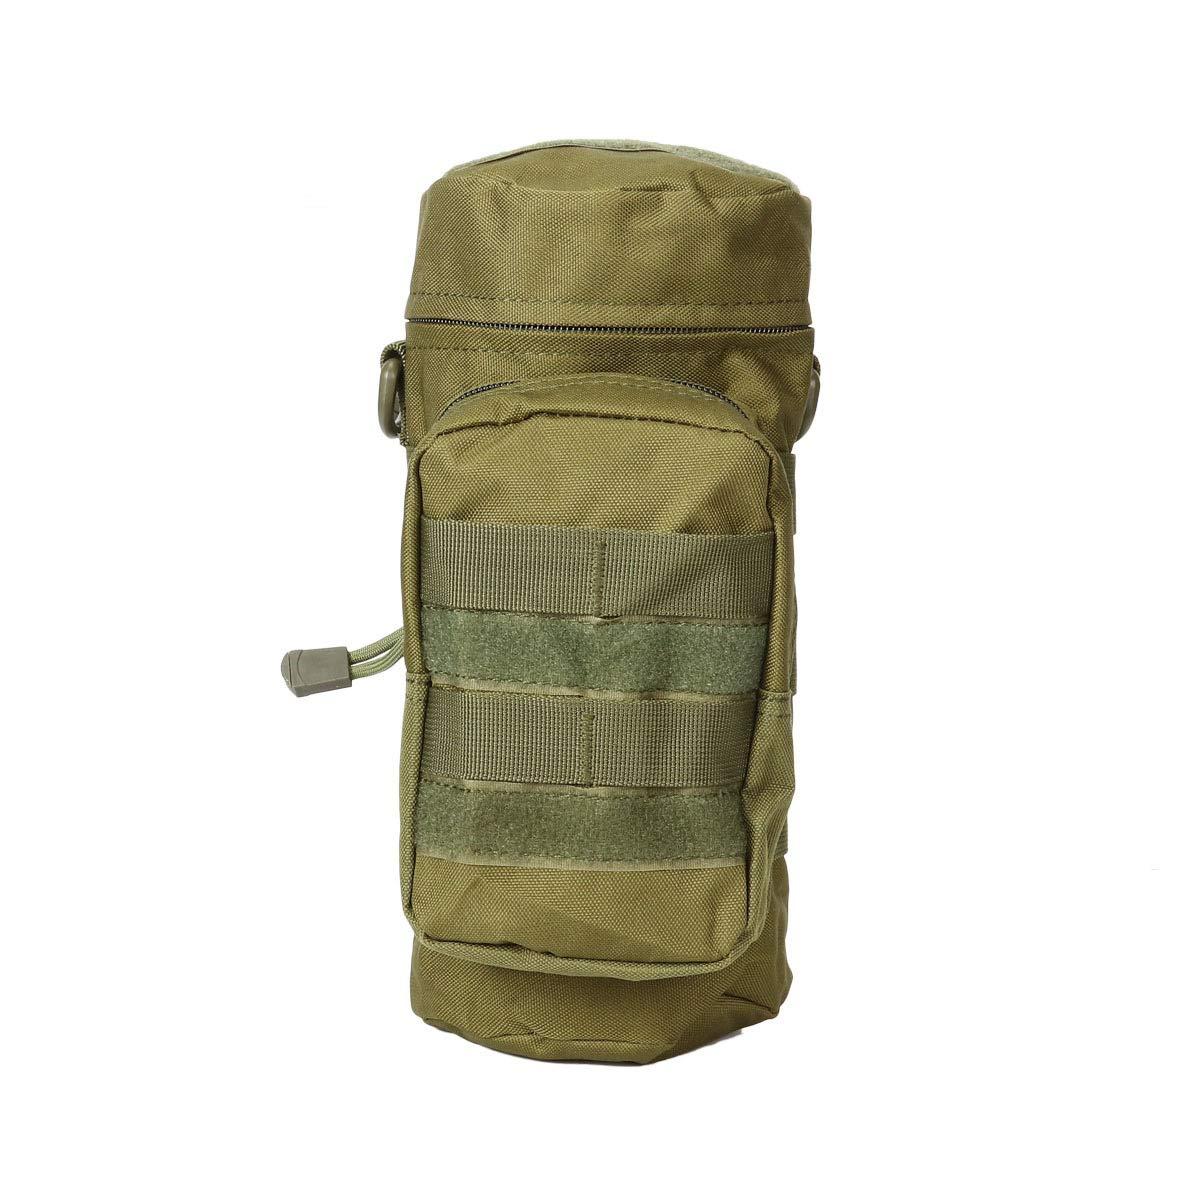 FreeLeben Porte-Bouteille d'eau, Extérieur Durable Tactical Military Molle Keelte Sac de Cantine Sac de Randonnée en Nylon Crossbody Camping